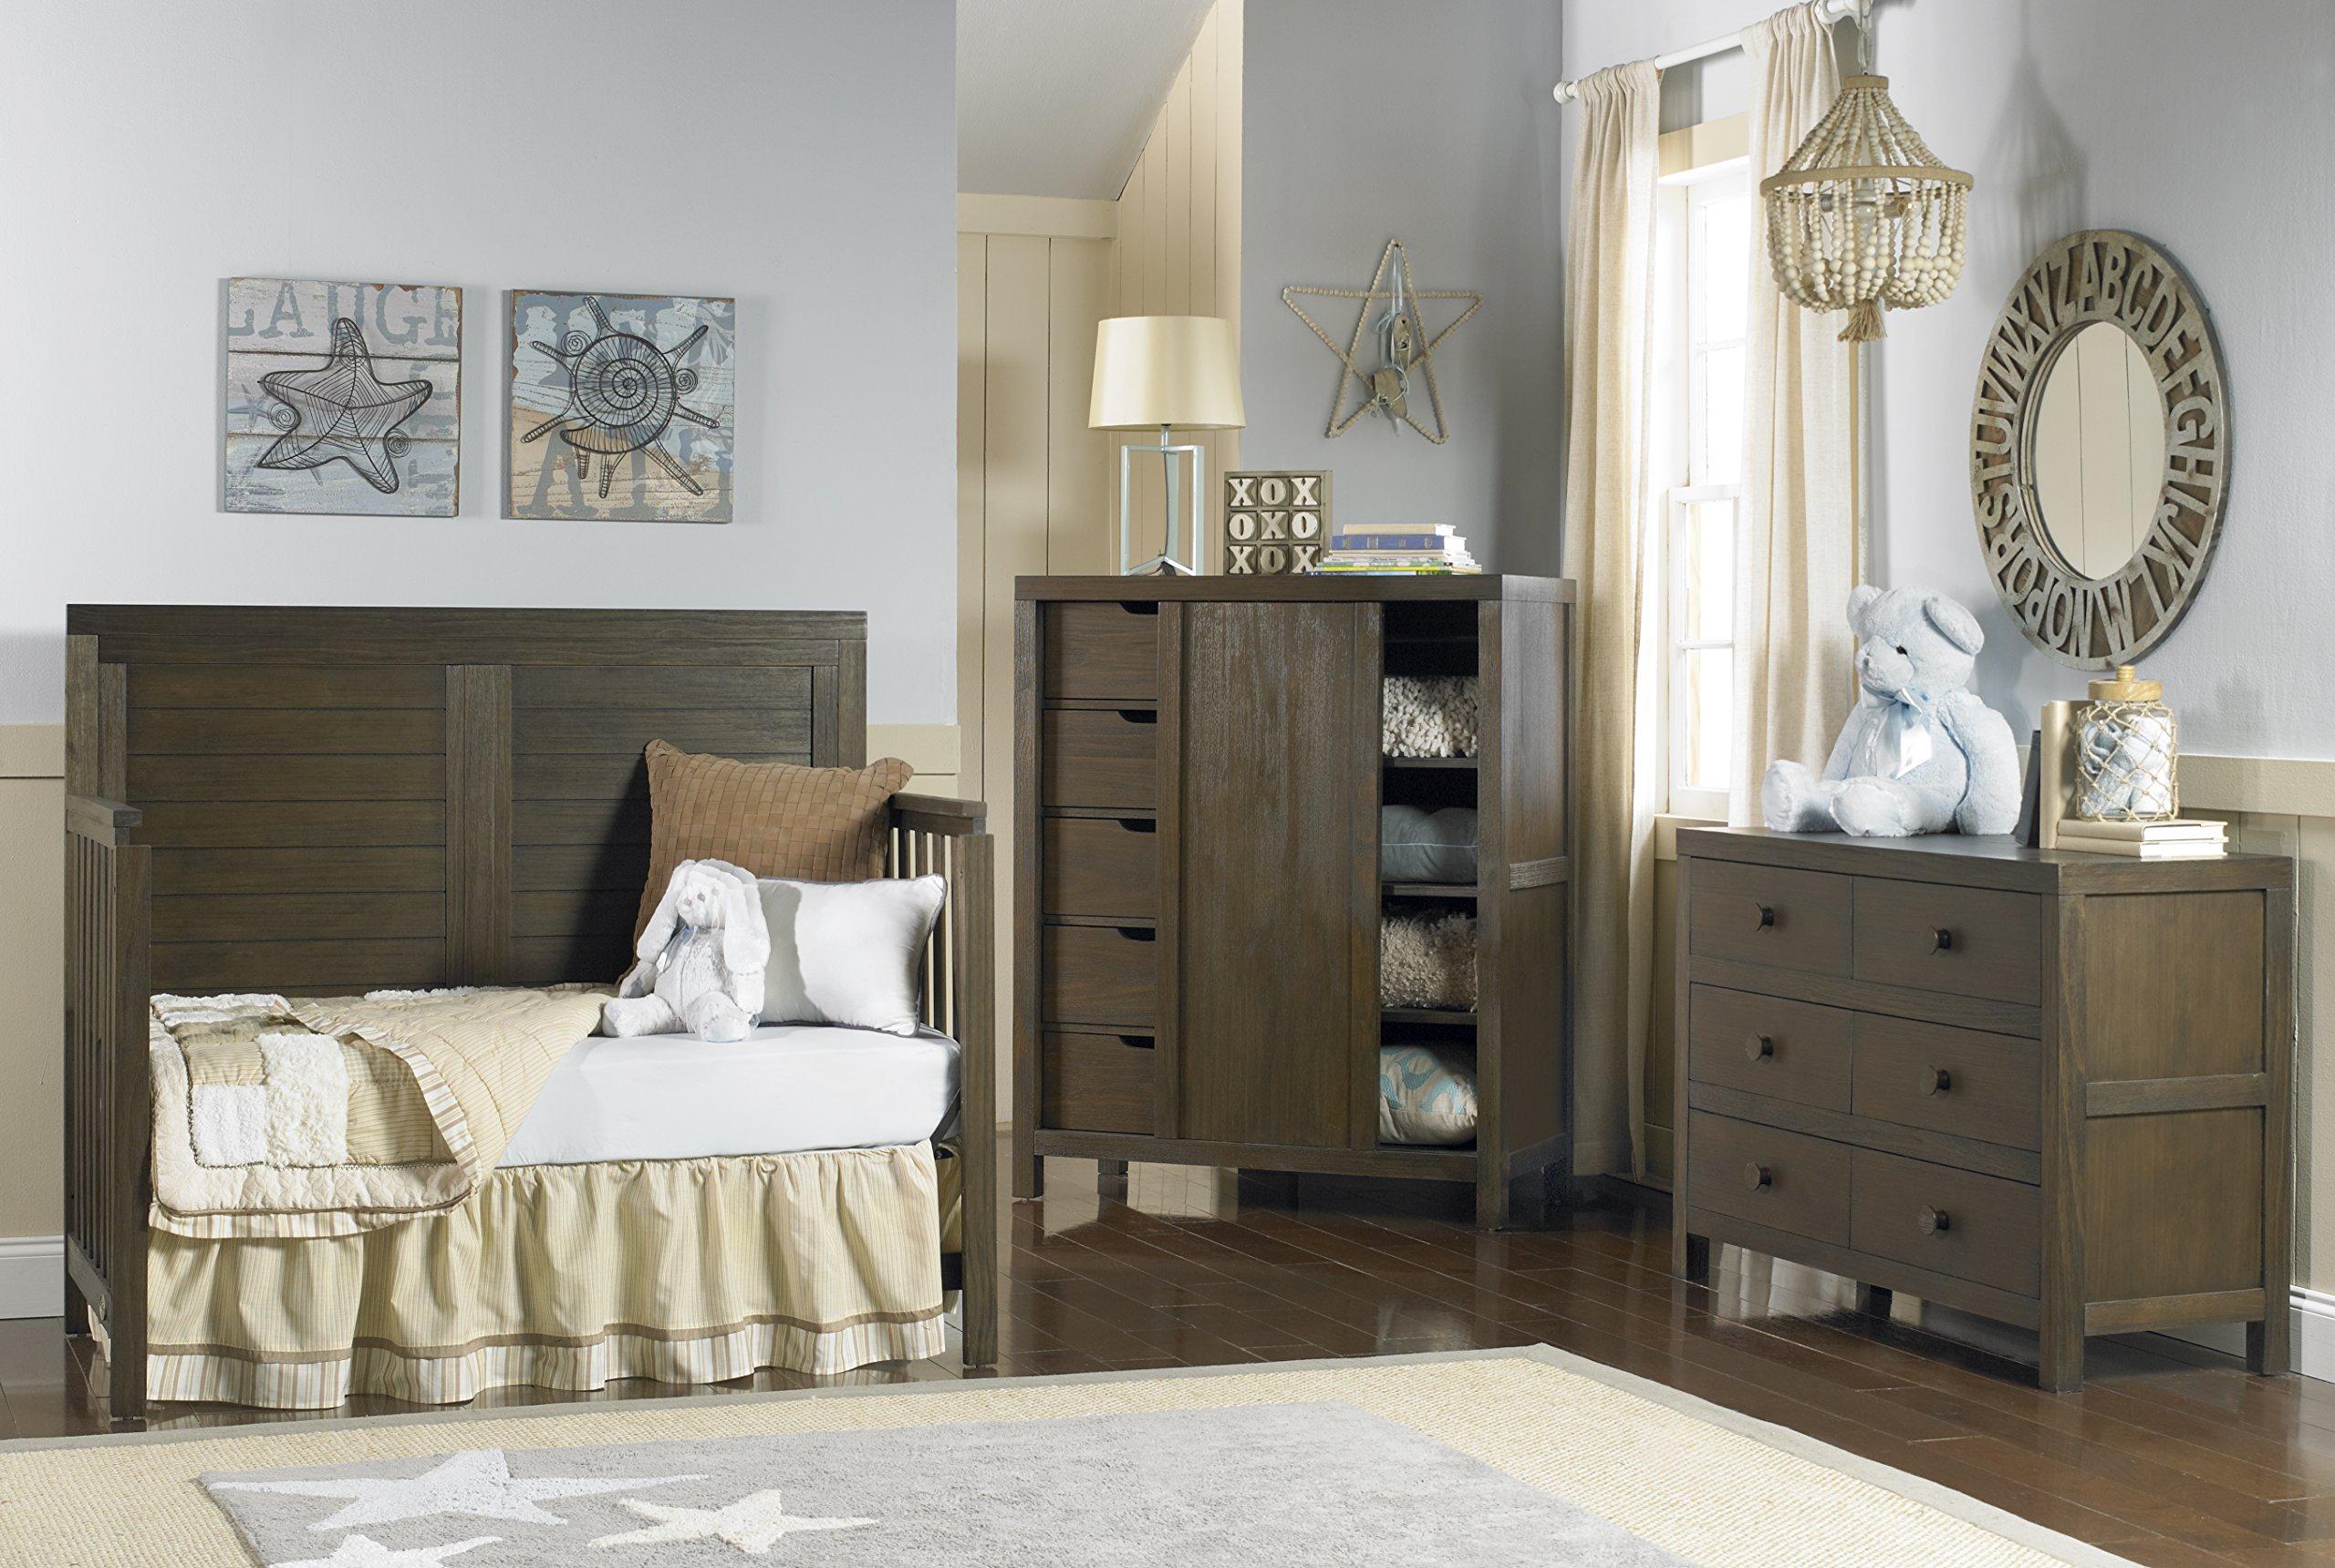 Ti Amo Castello 4 in 1 Convertible Crib, Wire Brushed Brown by Tiamo (Image #4)